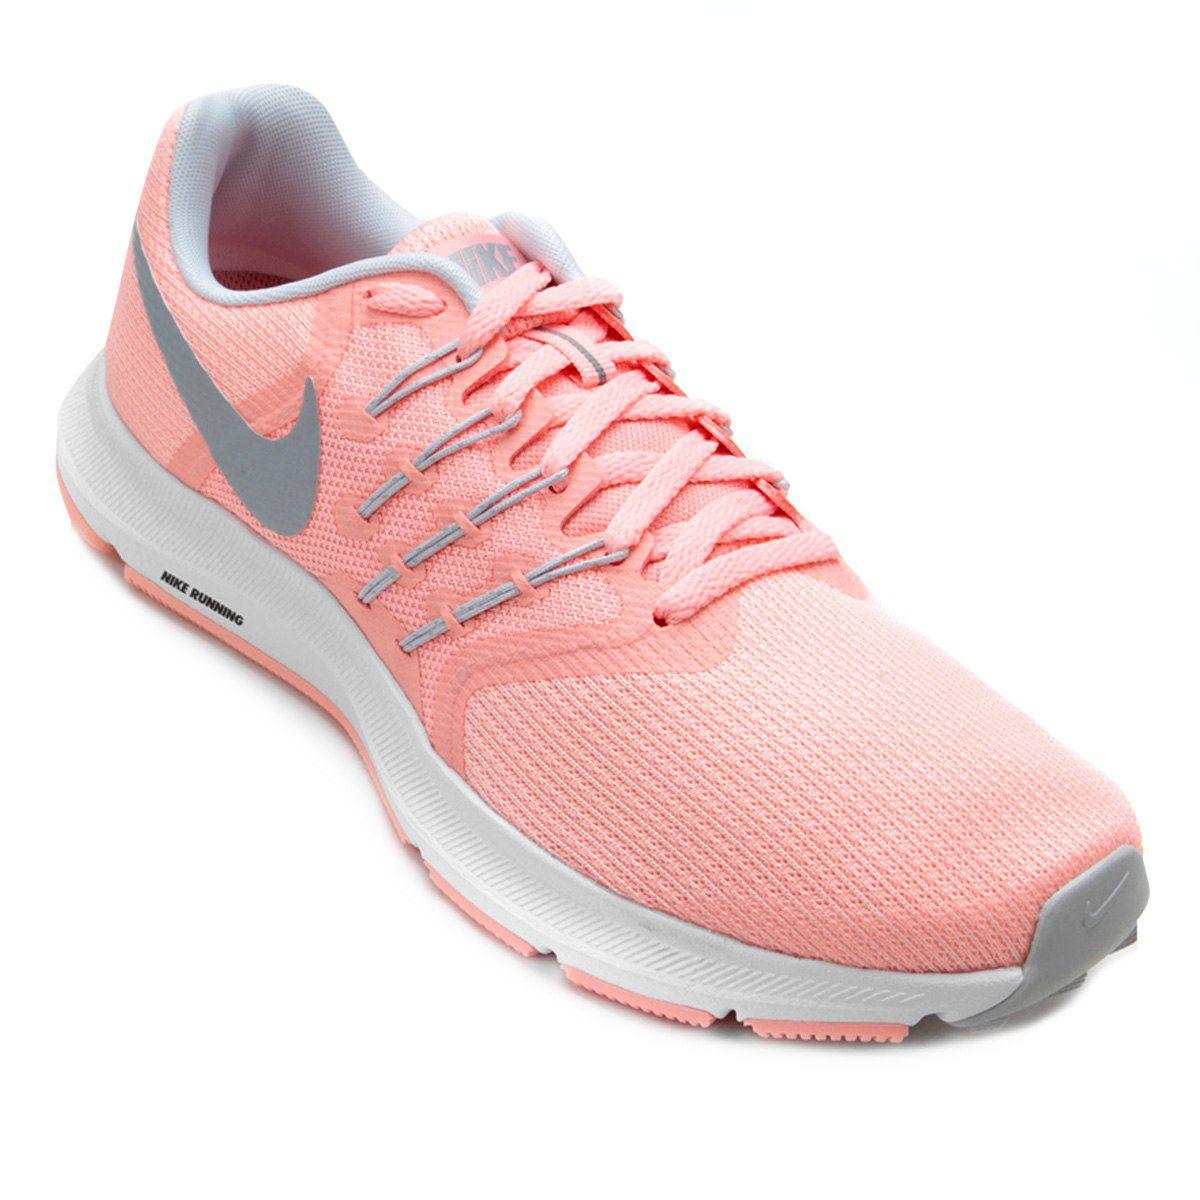 dc48aa1106 Tênis Nike Run Swift Cushlon Flywire Feminino - BRACIA SHOP  Loja de ...